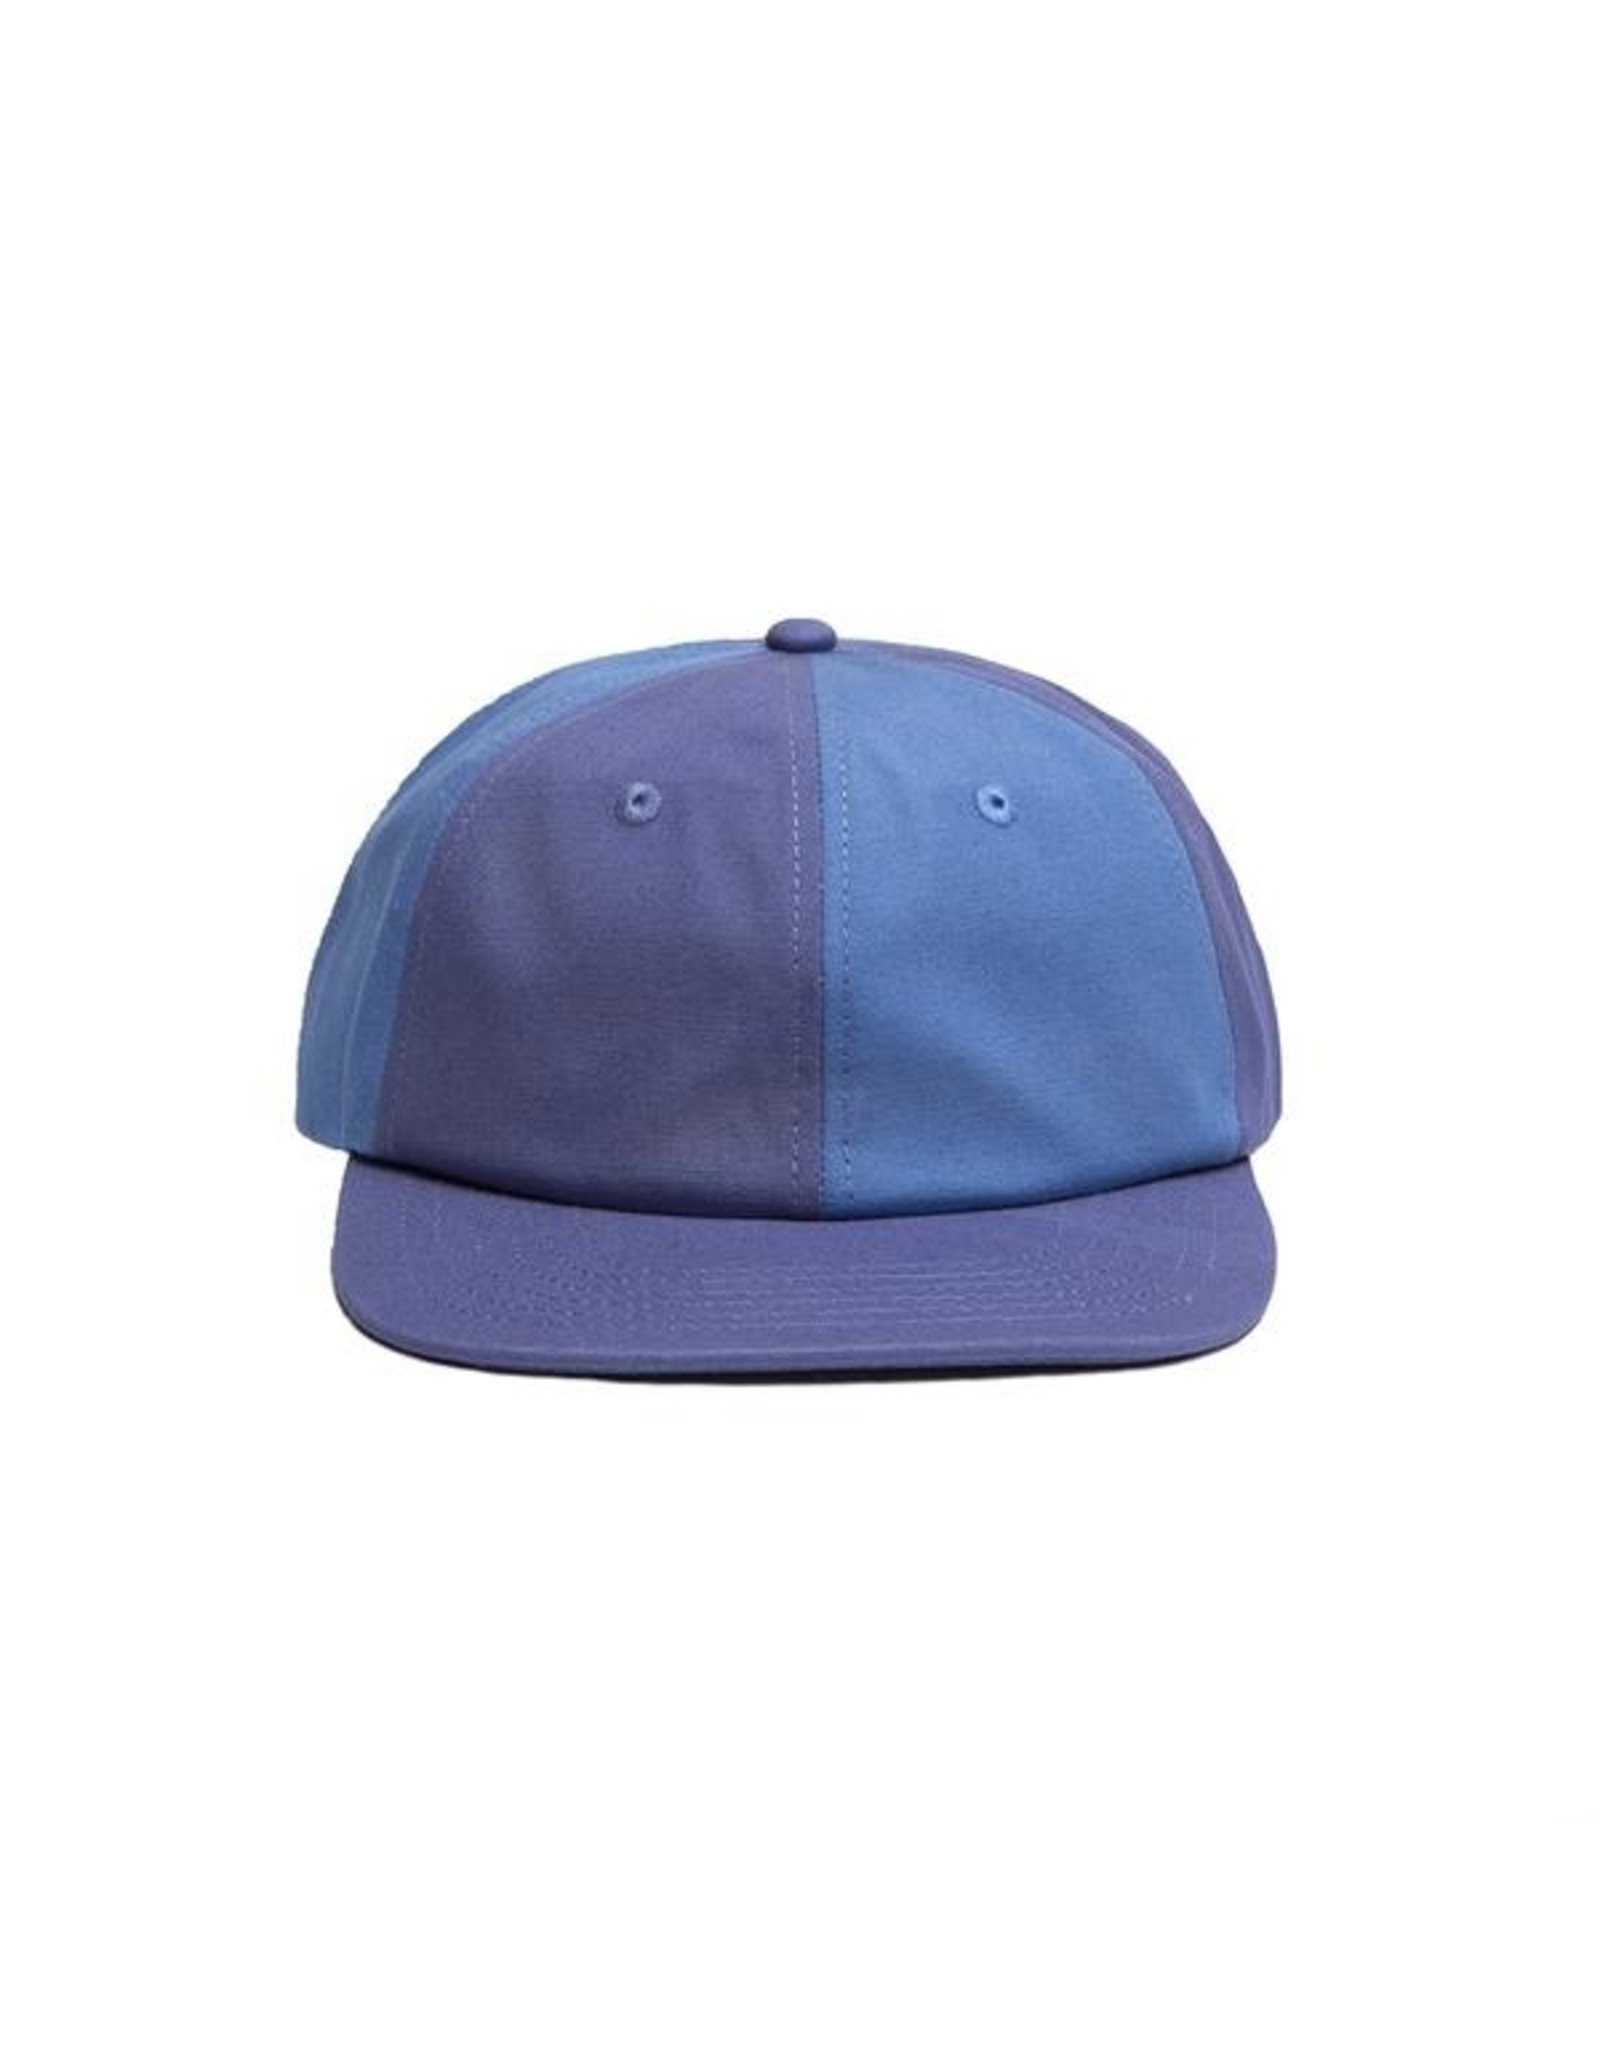 ALLTIMERS SKATEBOARD DECKS ALLTIMERS - TONE DEF HAT - BLUE